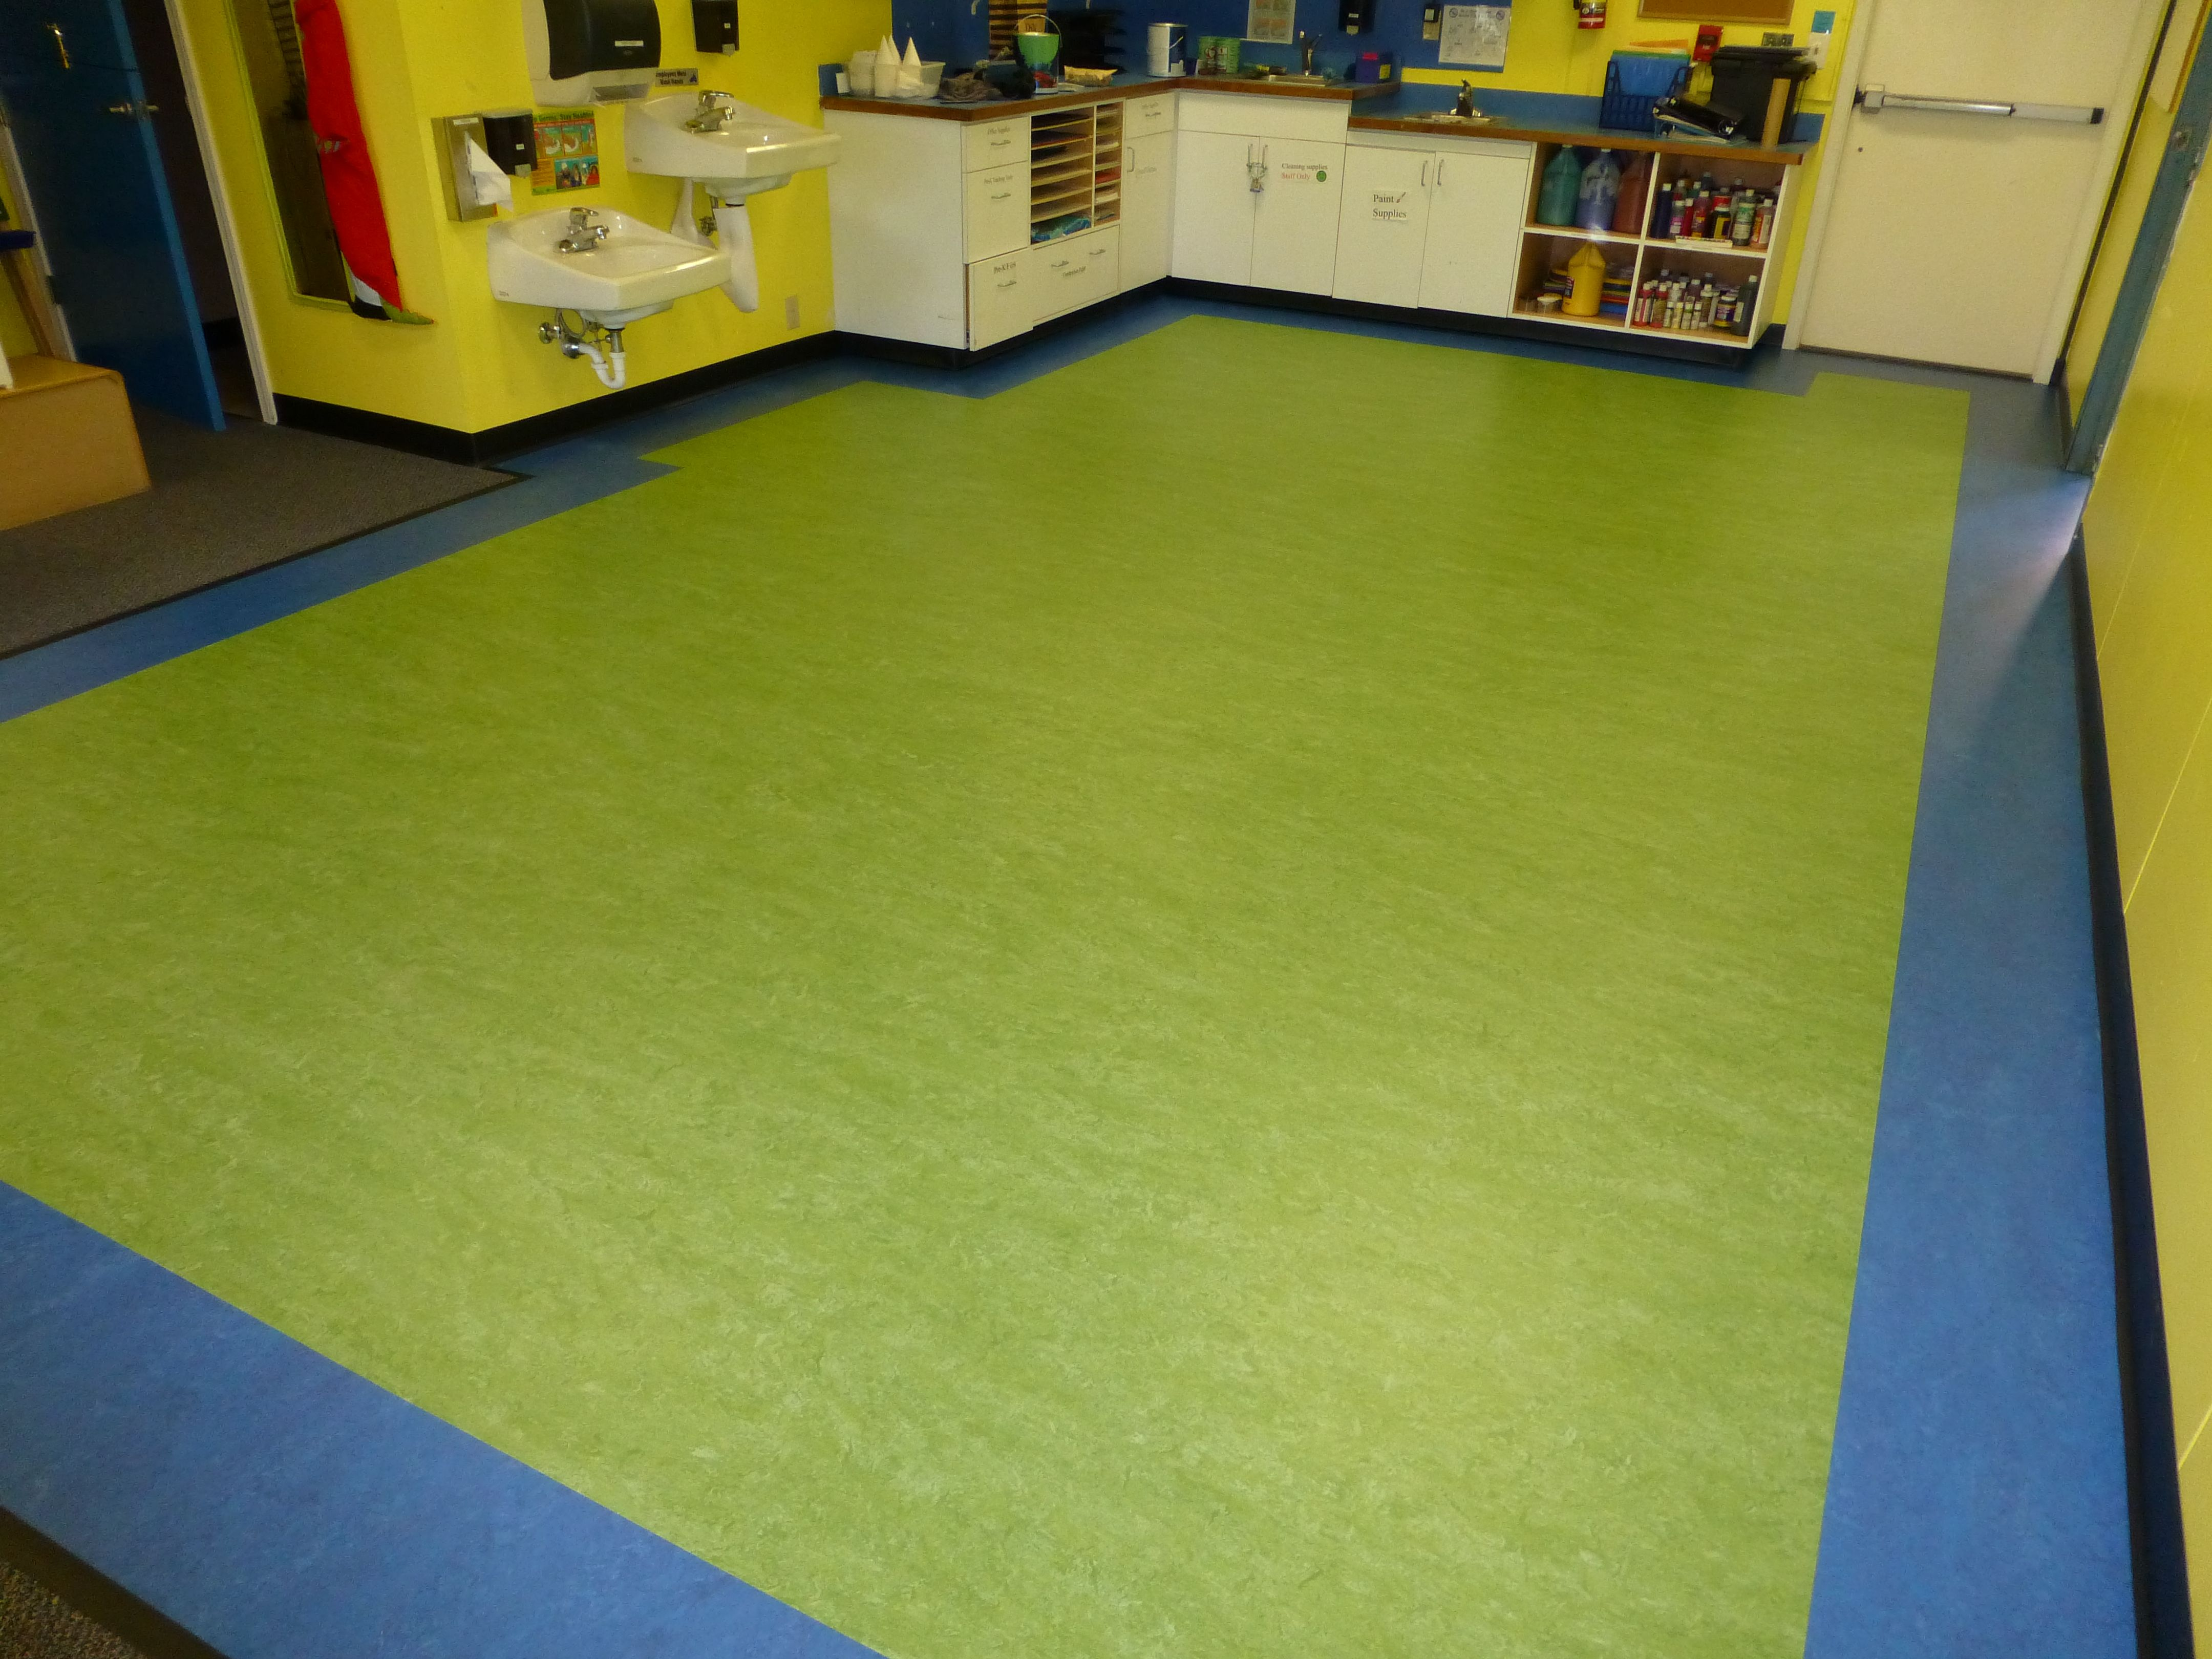 Marmoleum Floor Installed In A Classroom With Custom Border Interior Floor Designs Seattle Wa Marmoleum Floor Design Floor Installation